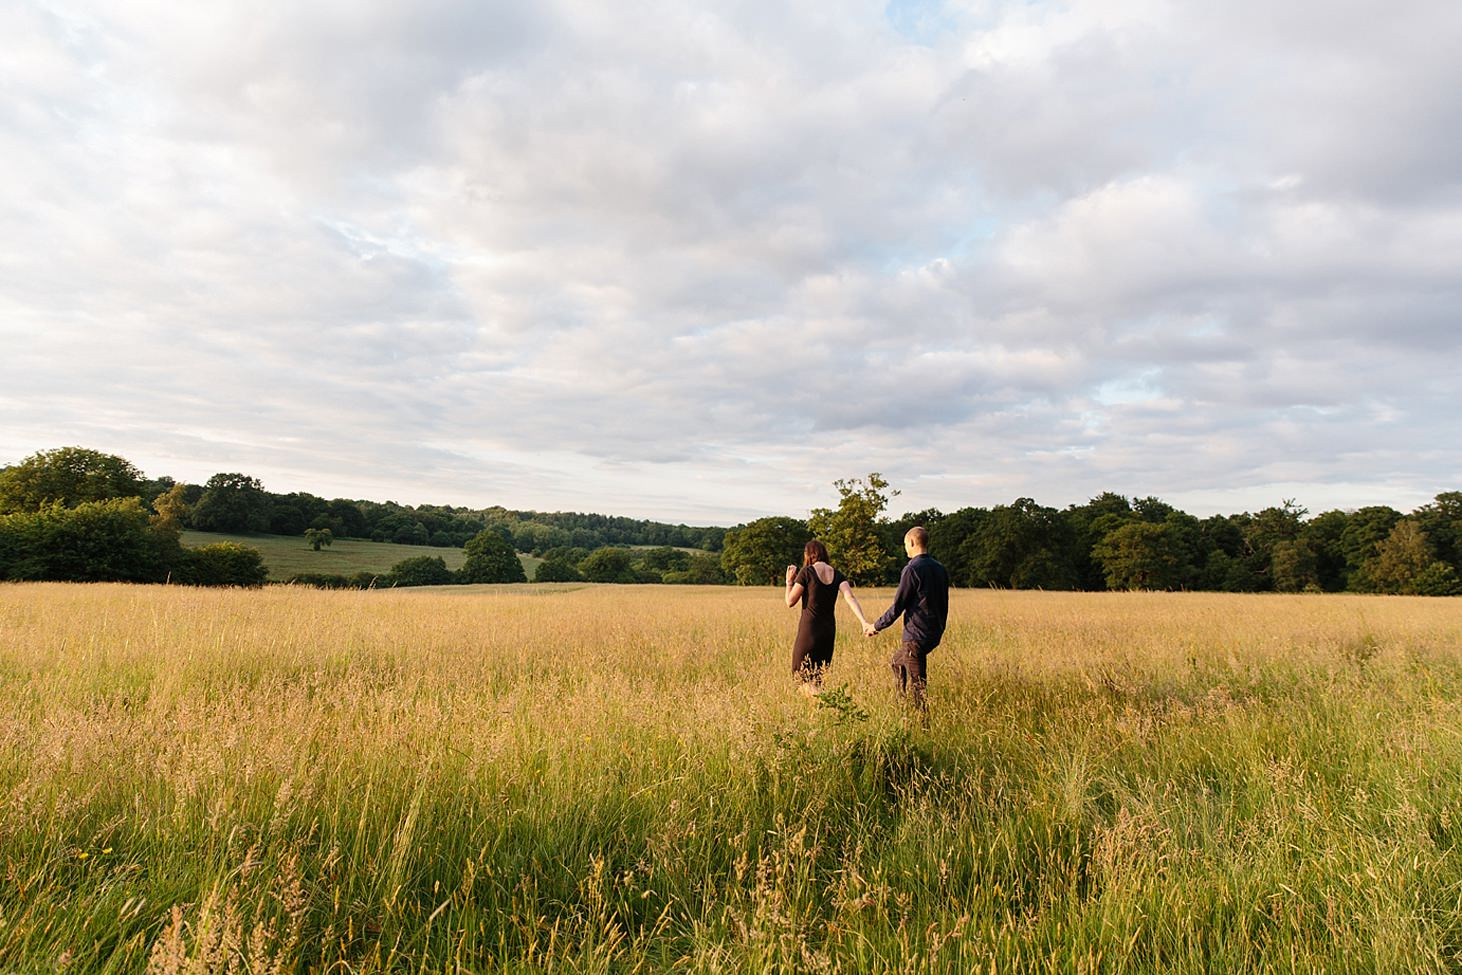 trent park engagement shoot walking through fields